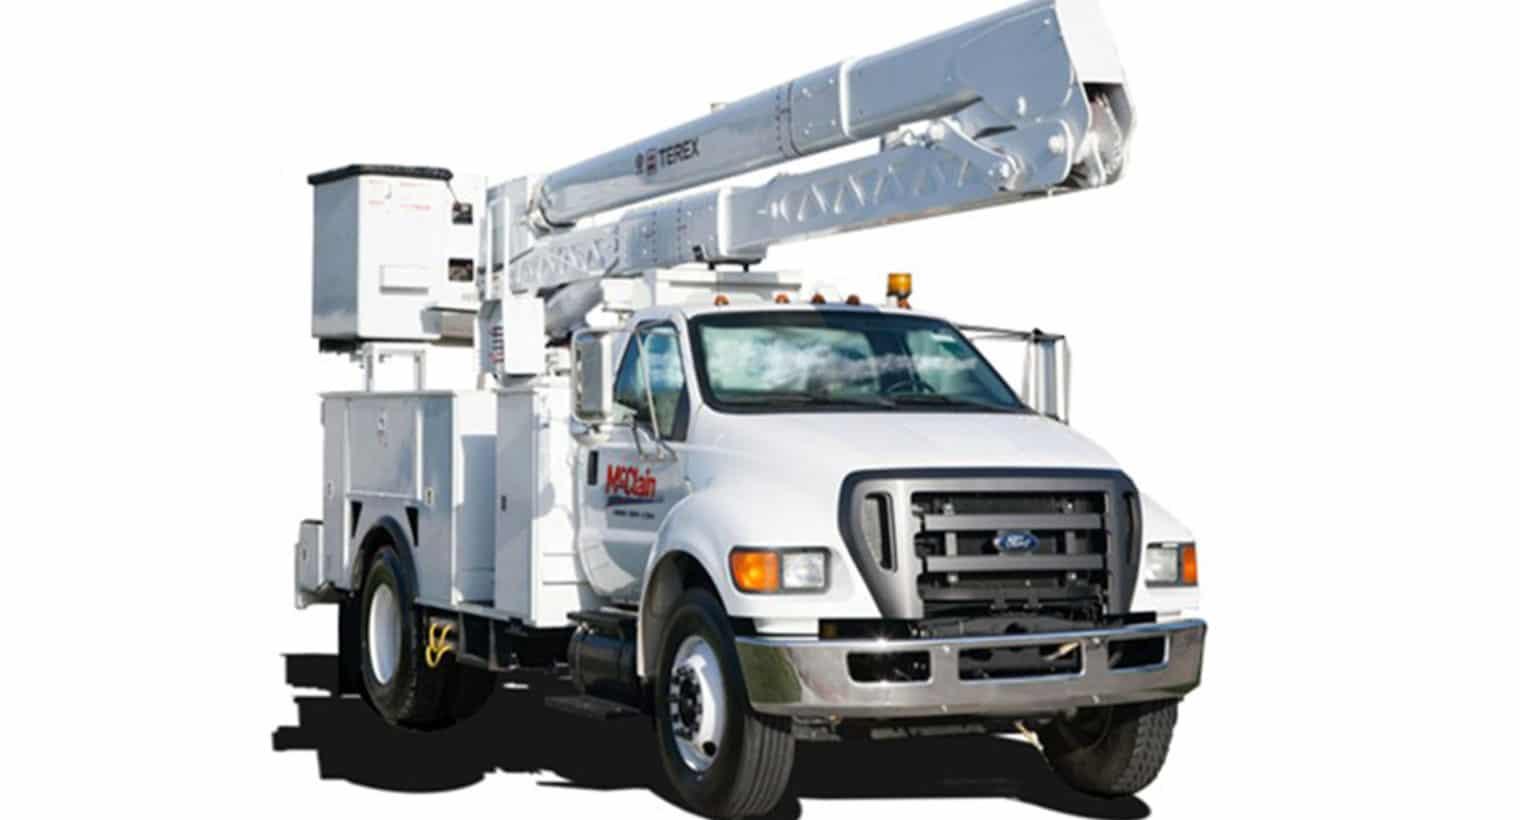 McClain & Co., Inc. - 55ft Bucket Truck Rental